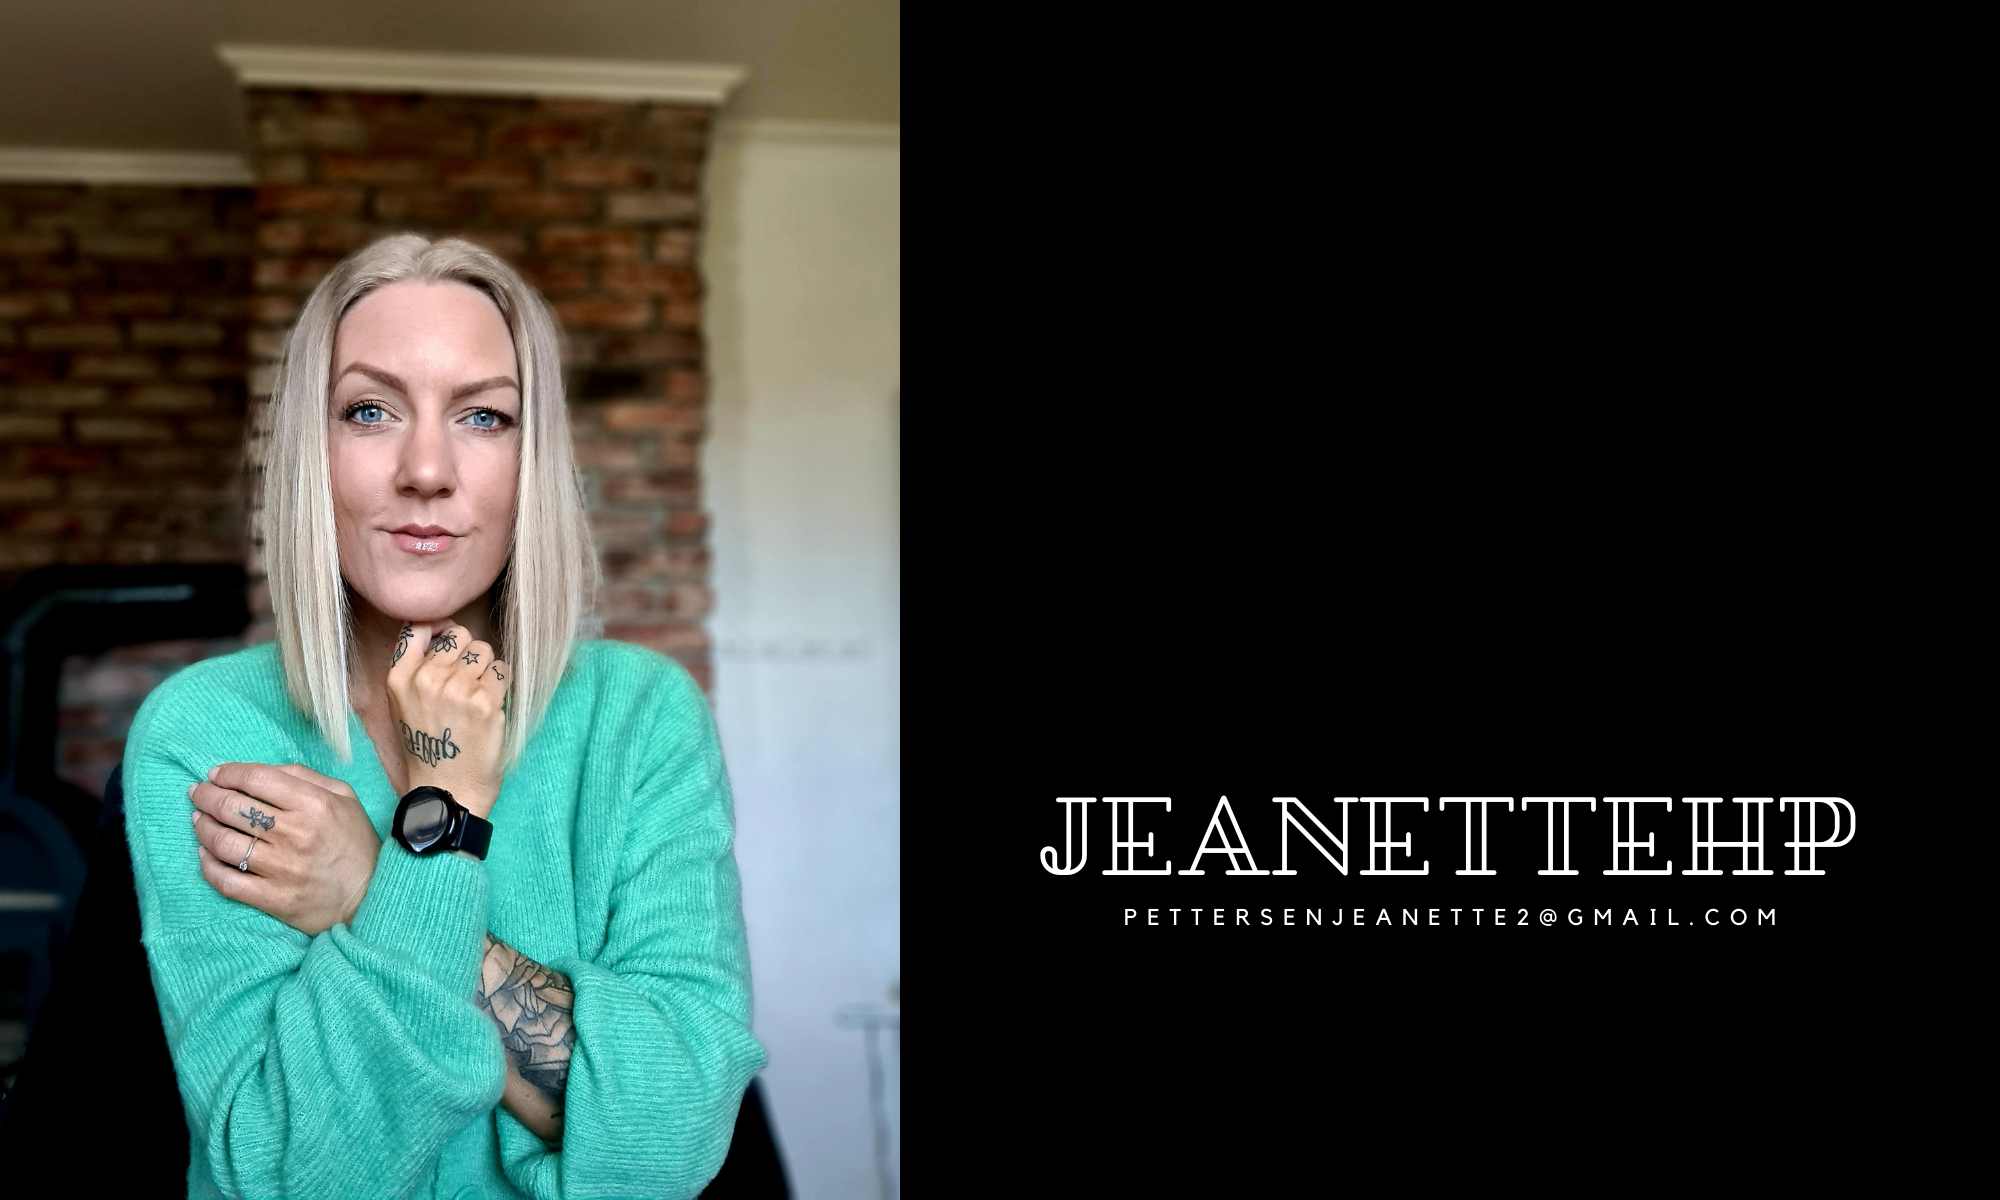 Jeanette.hp